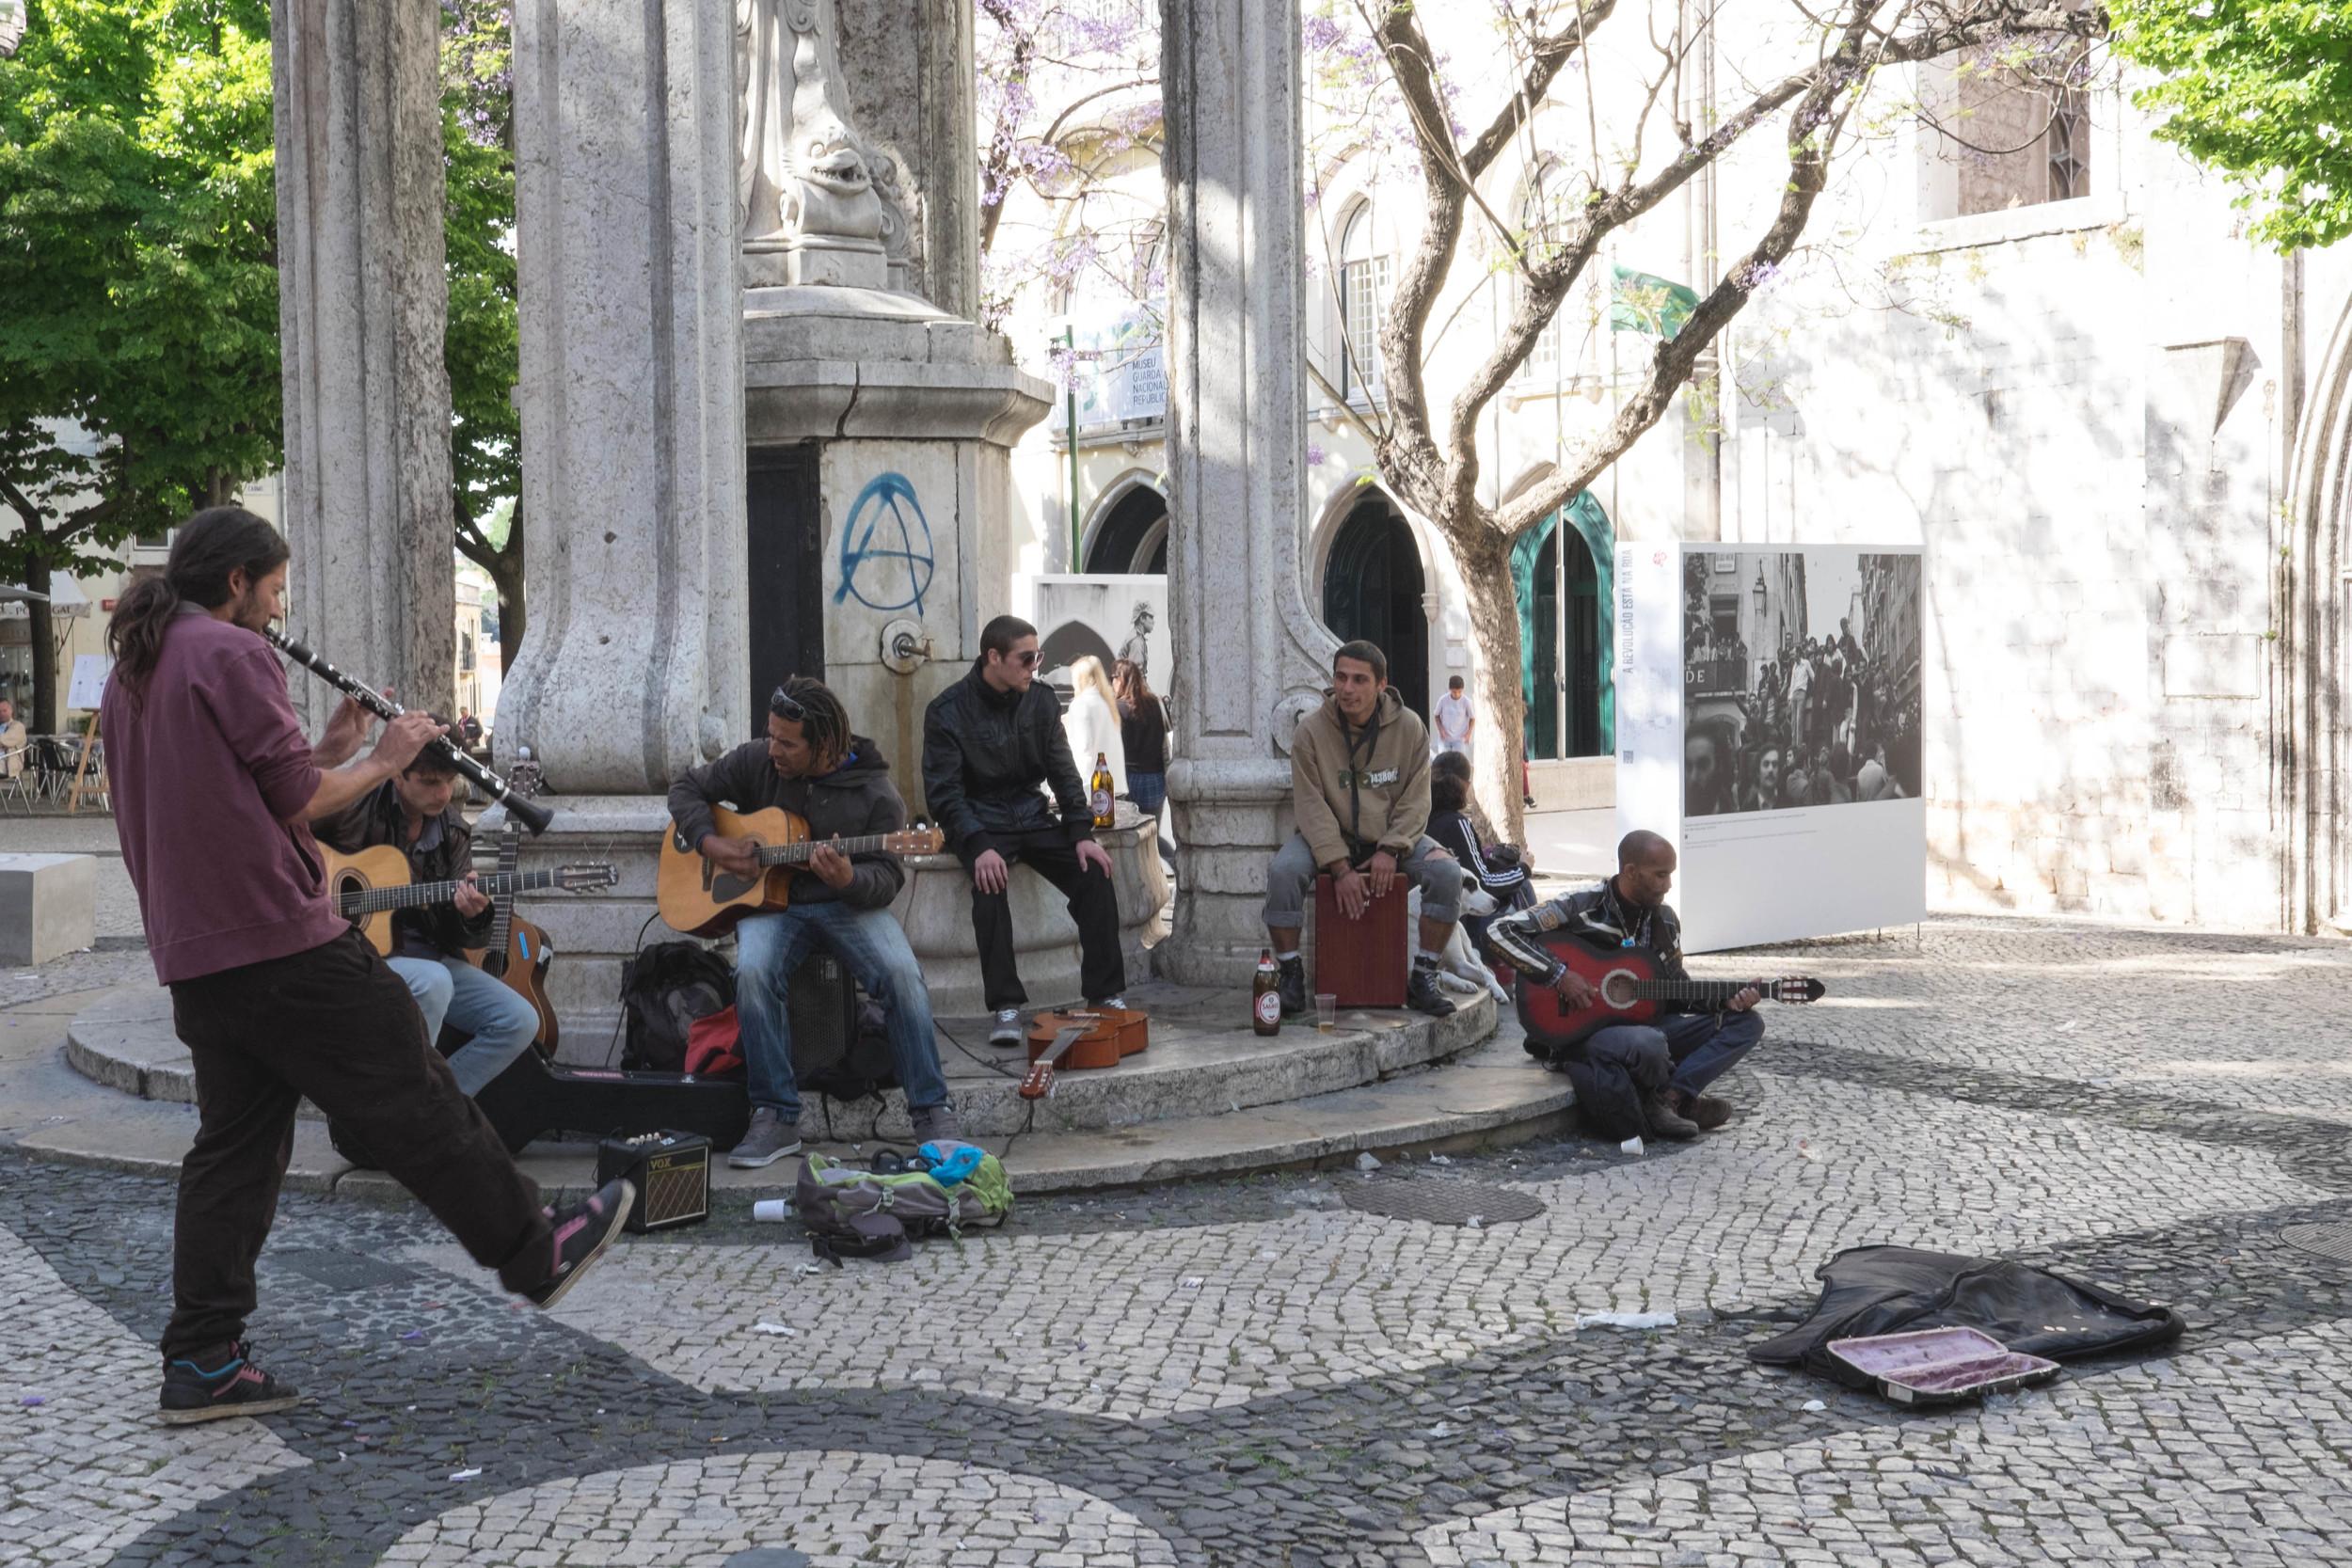 Kristen_Humbert_Philadelpia_Photographer_Travel_Editorial_Portugal-3386.jpg